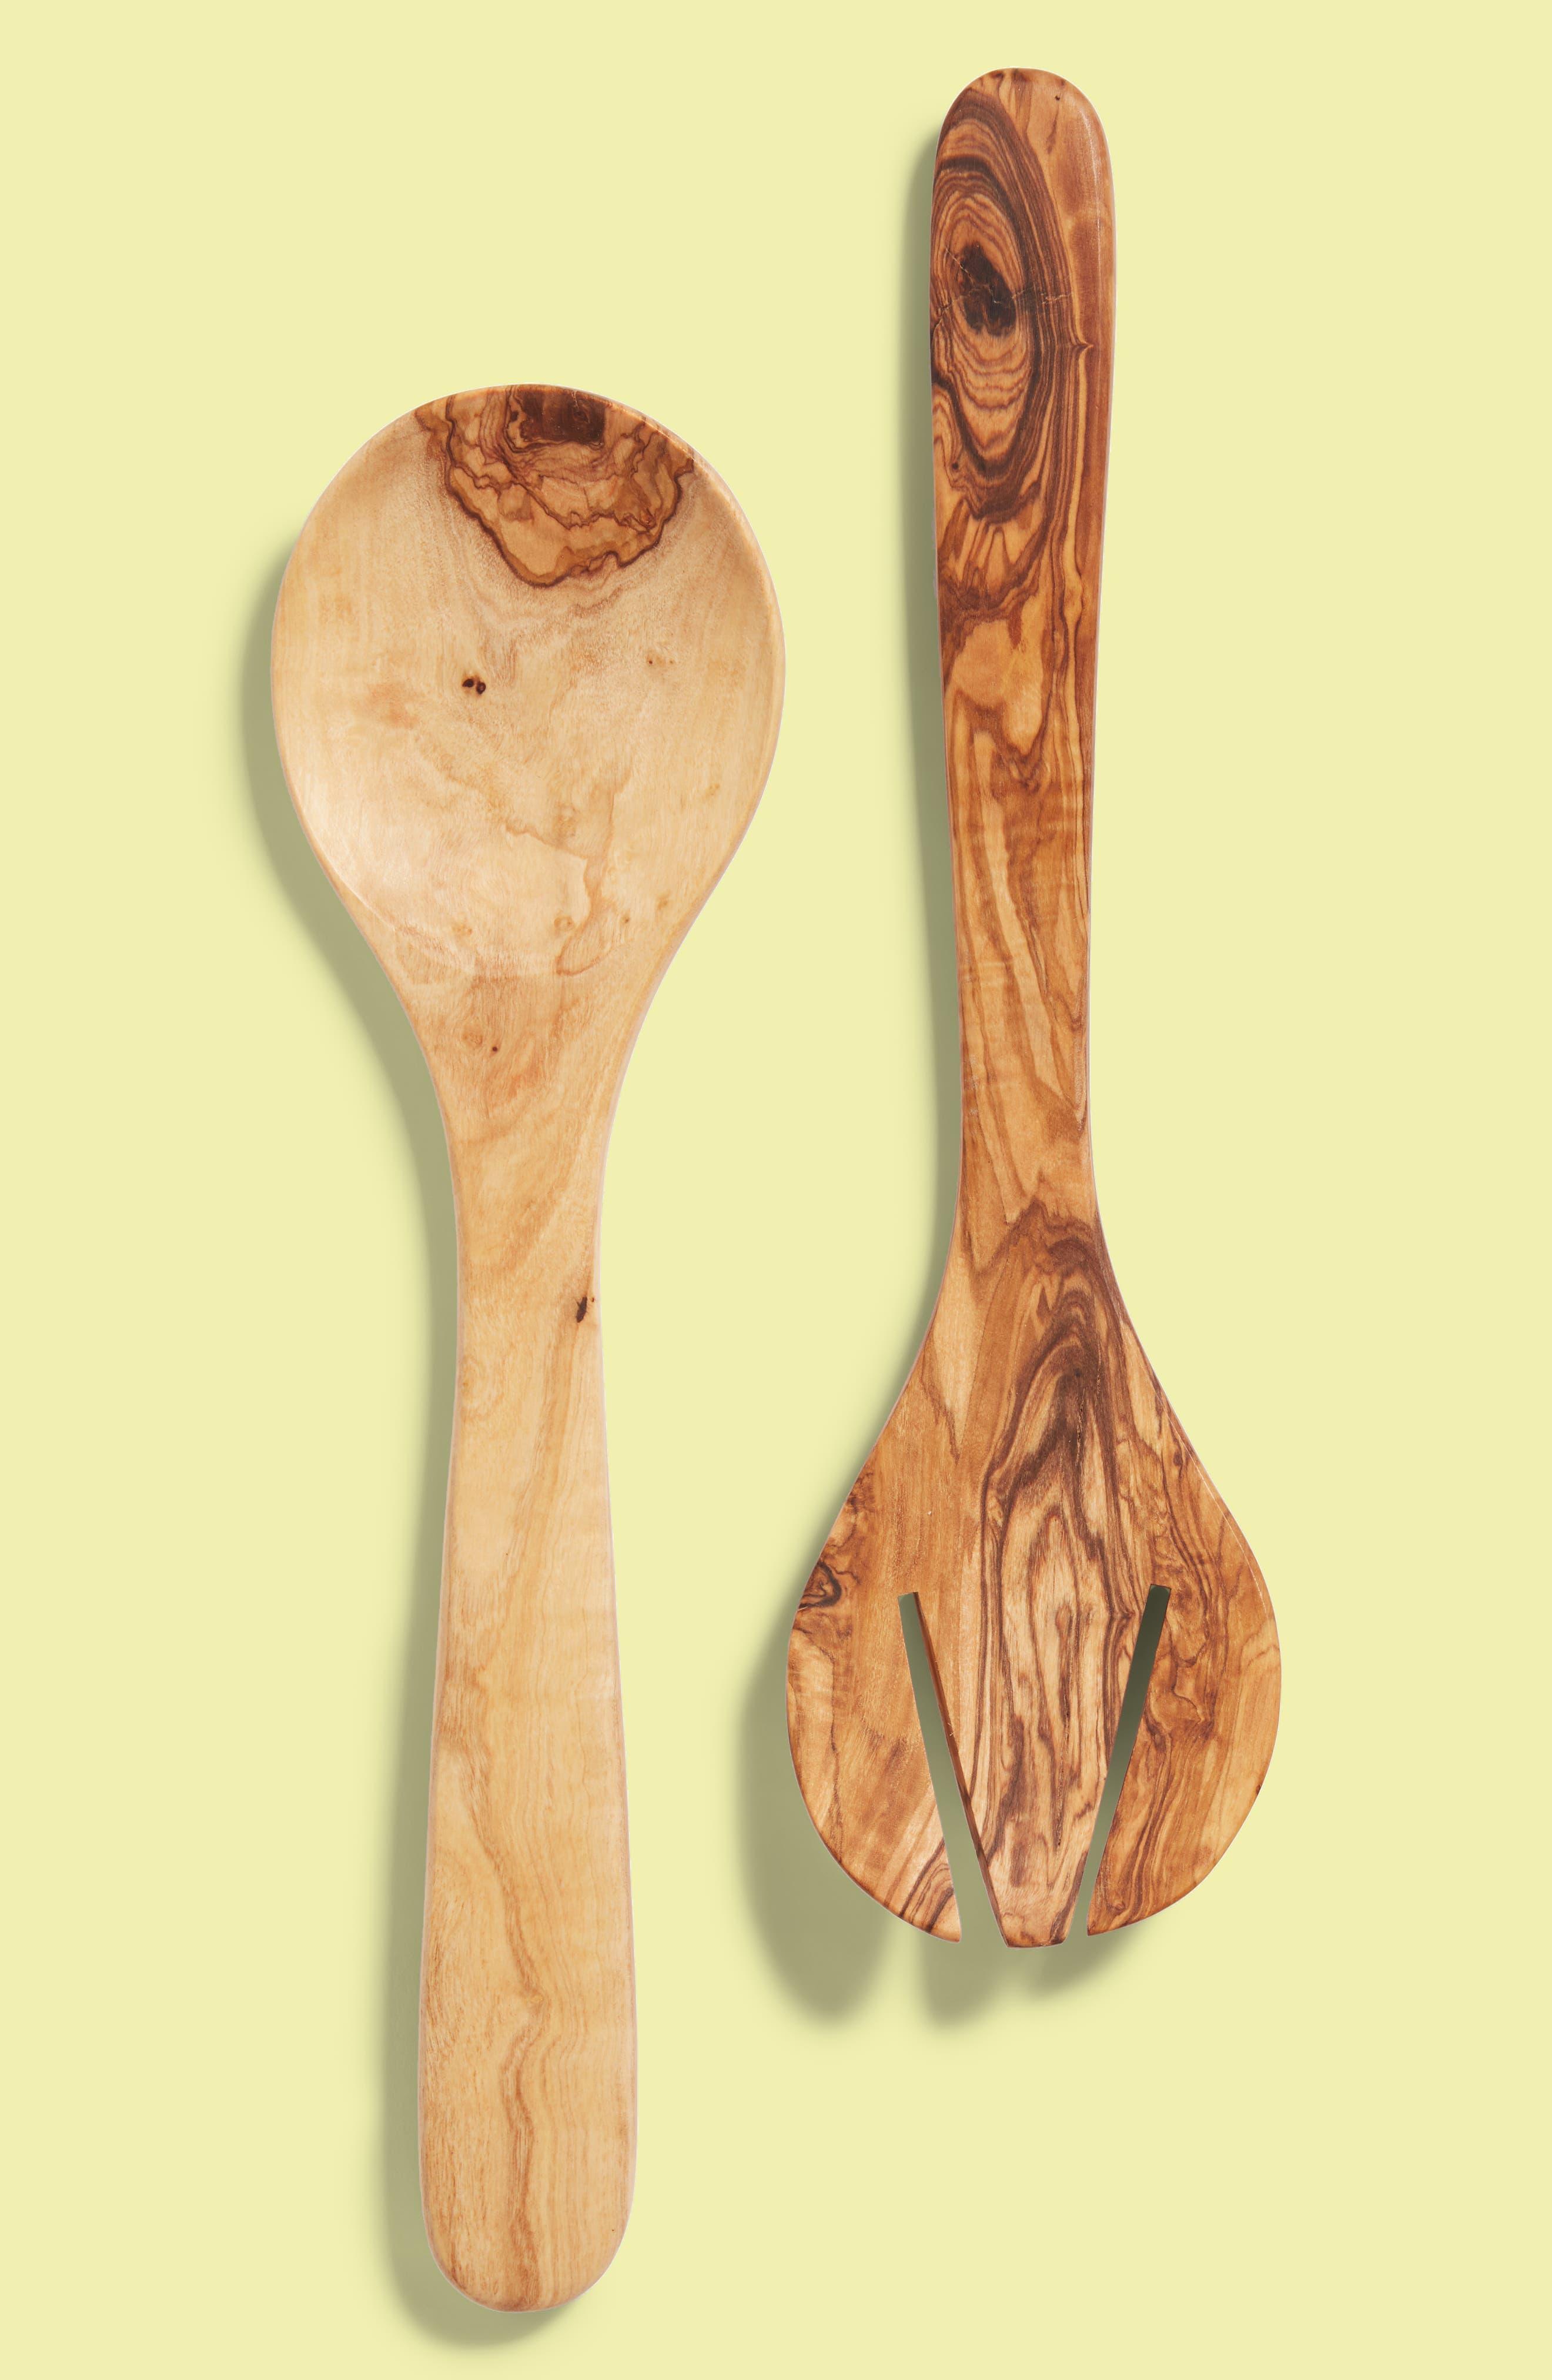 2-Piece Olive Wood Round Serving Set,                         Main,                         color, 200